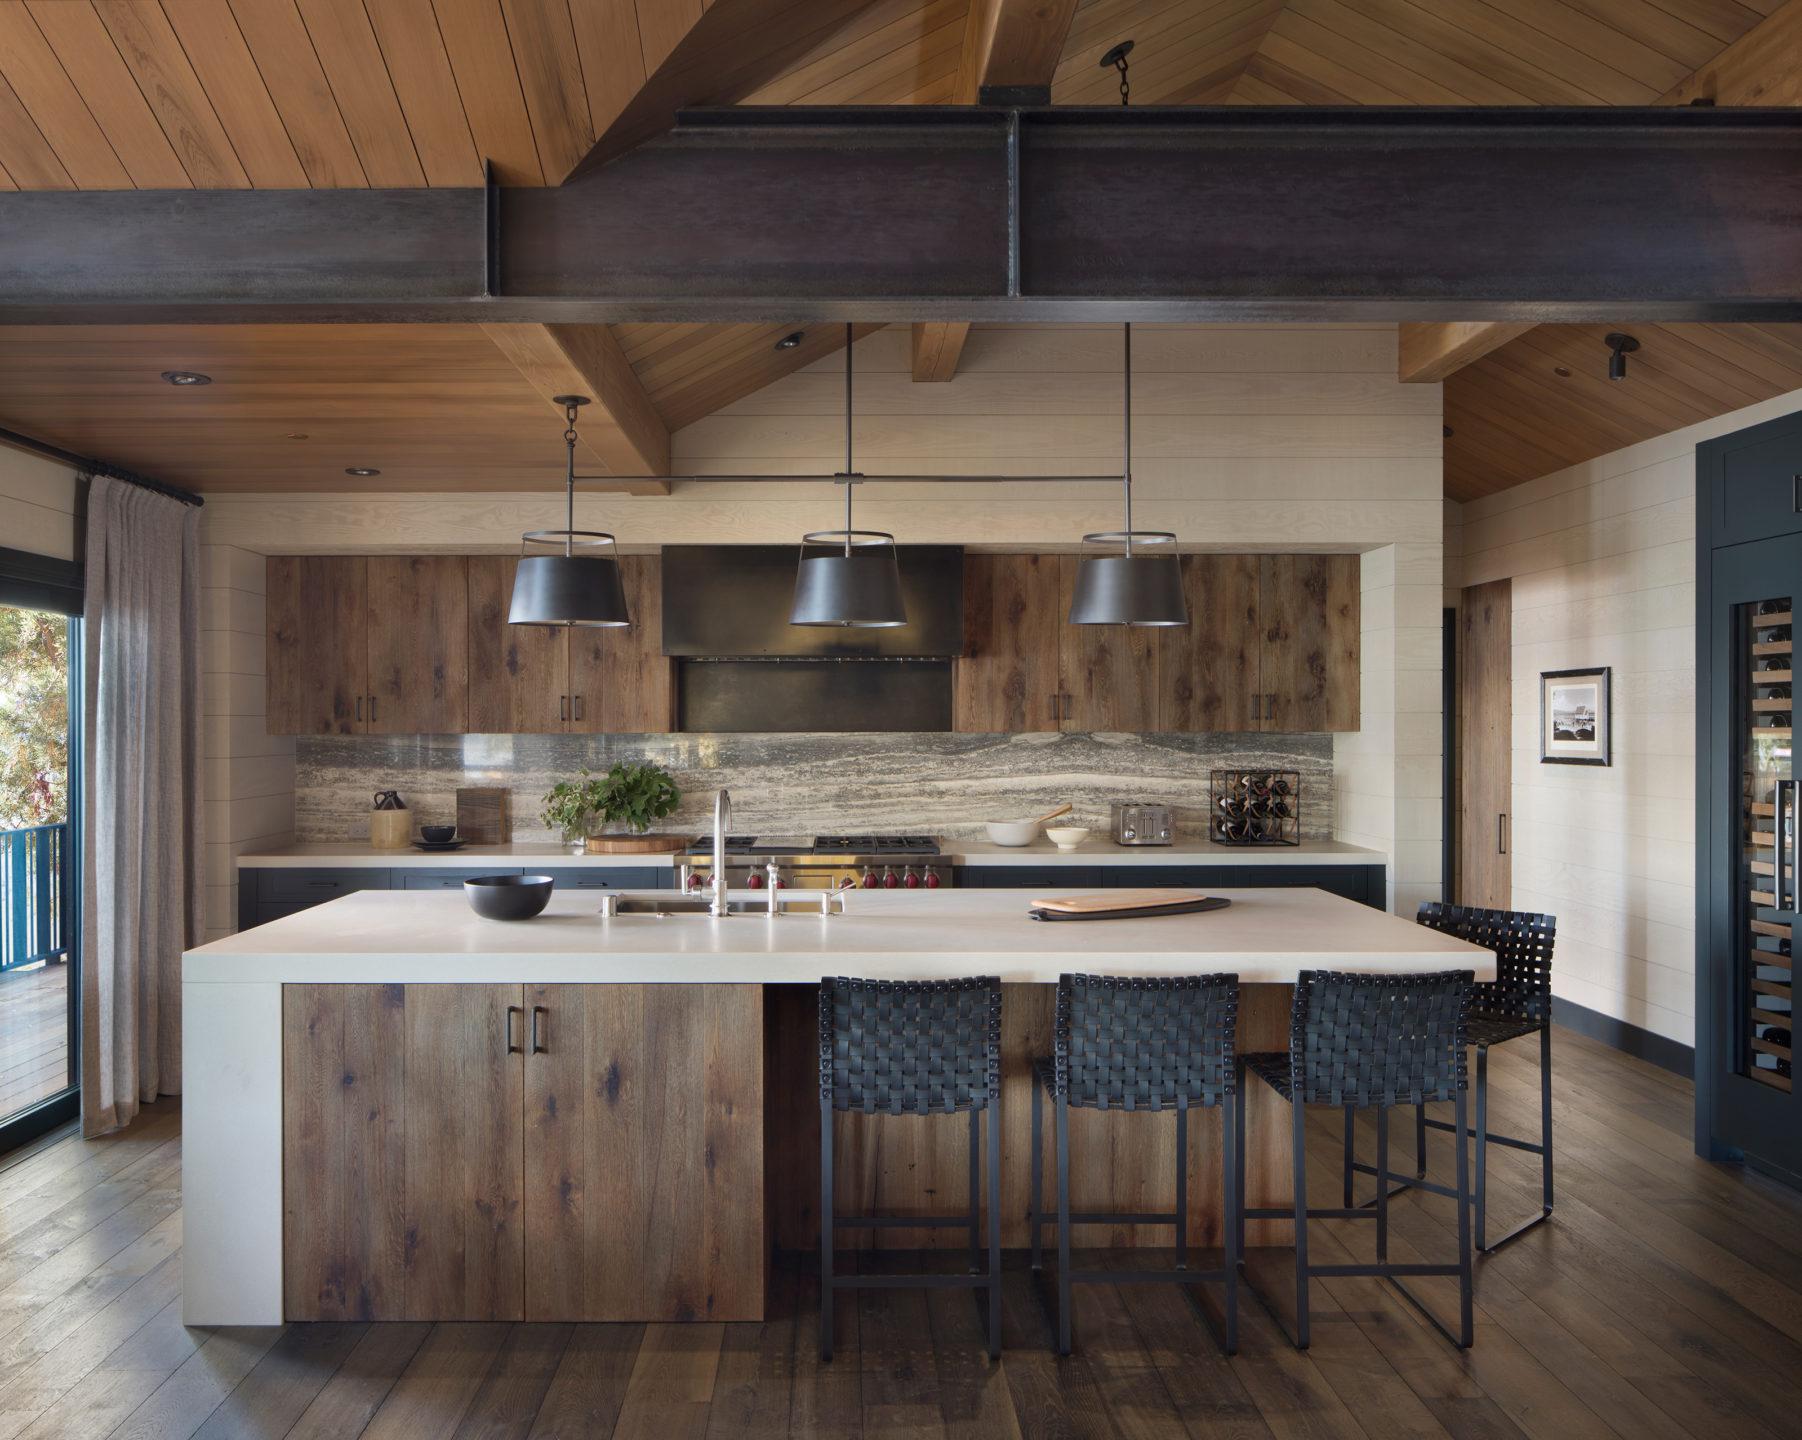 Jennifer_robins_interiors_projects_lake_tahoe_Leupold_08_off_kitchen_island_barstools